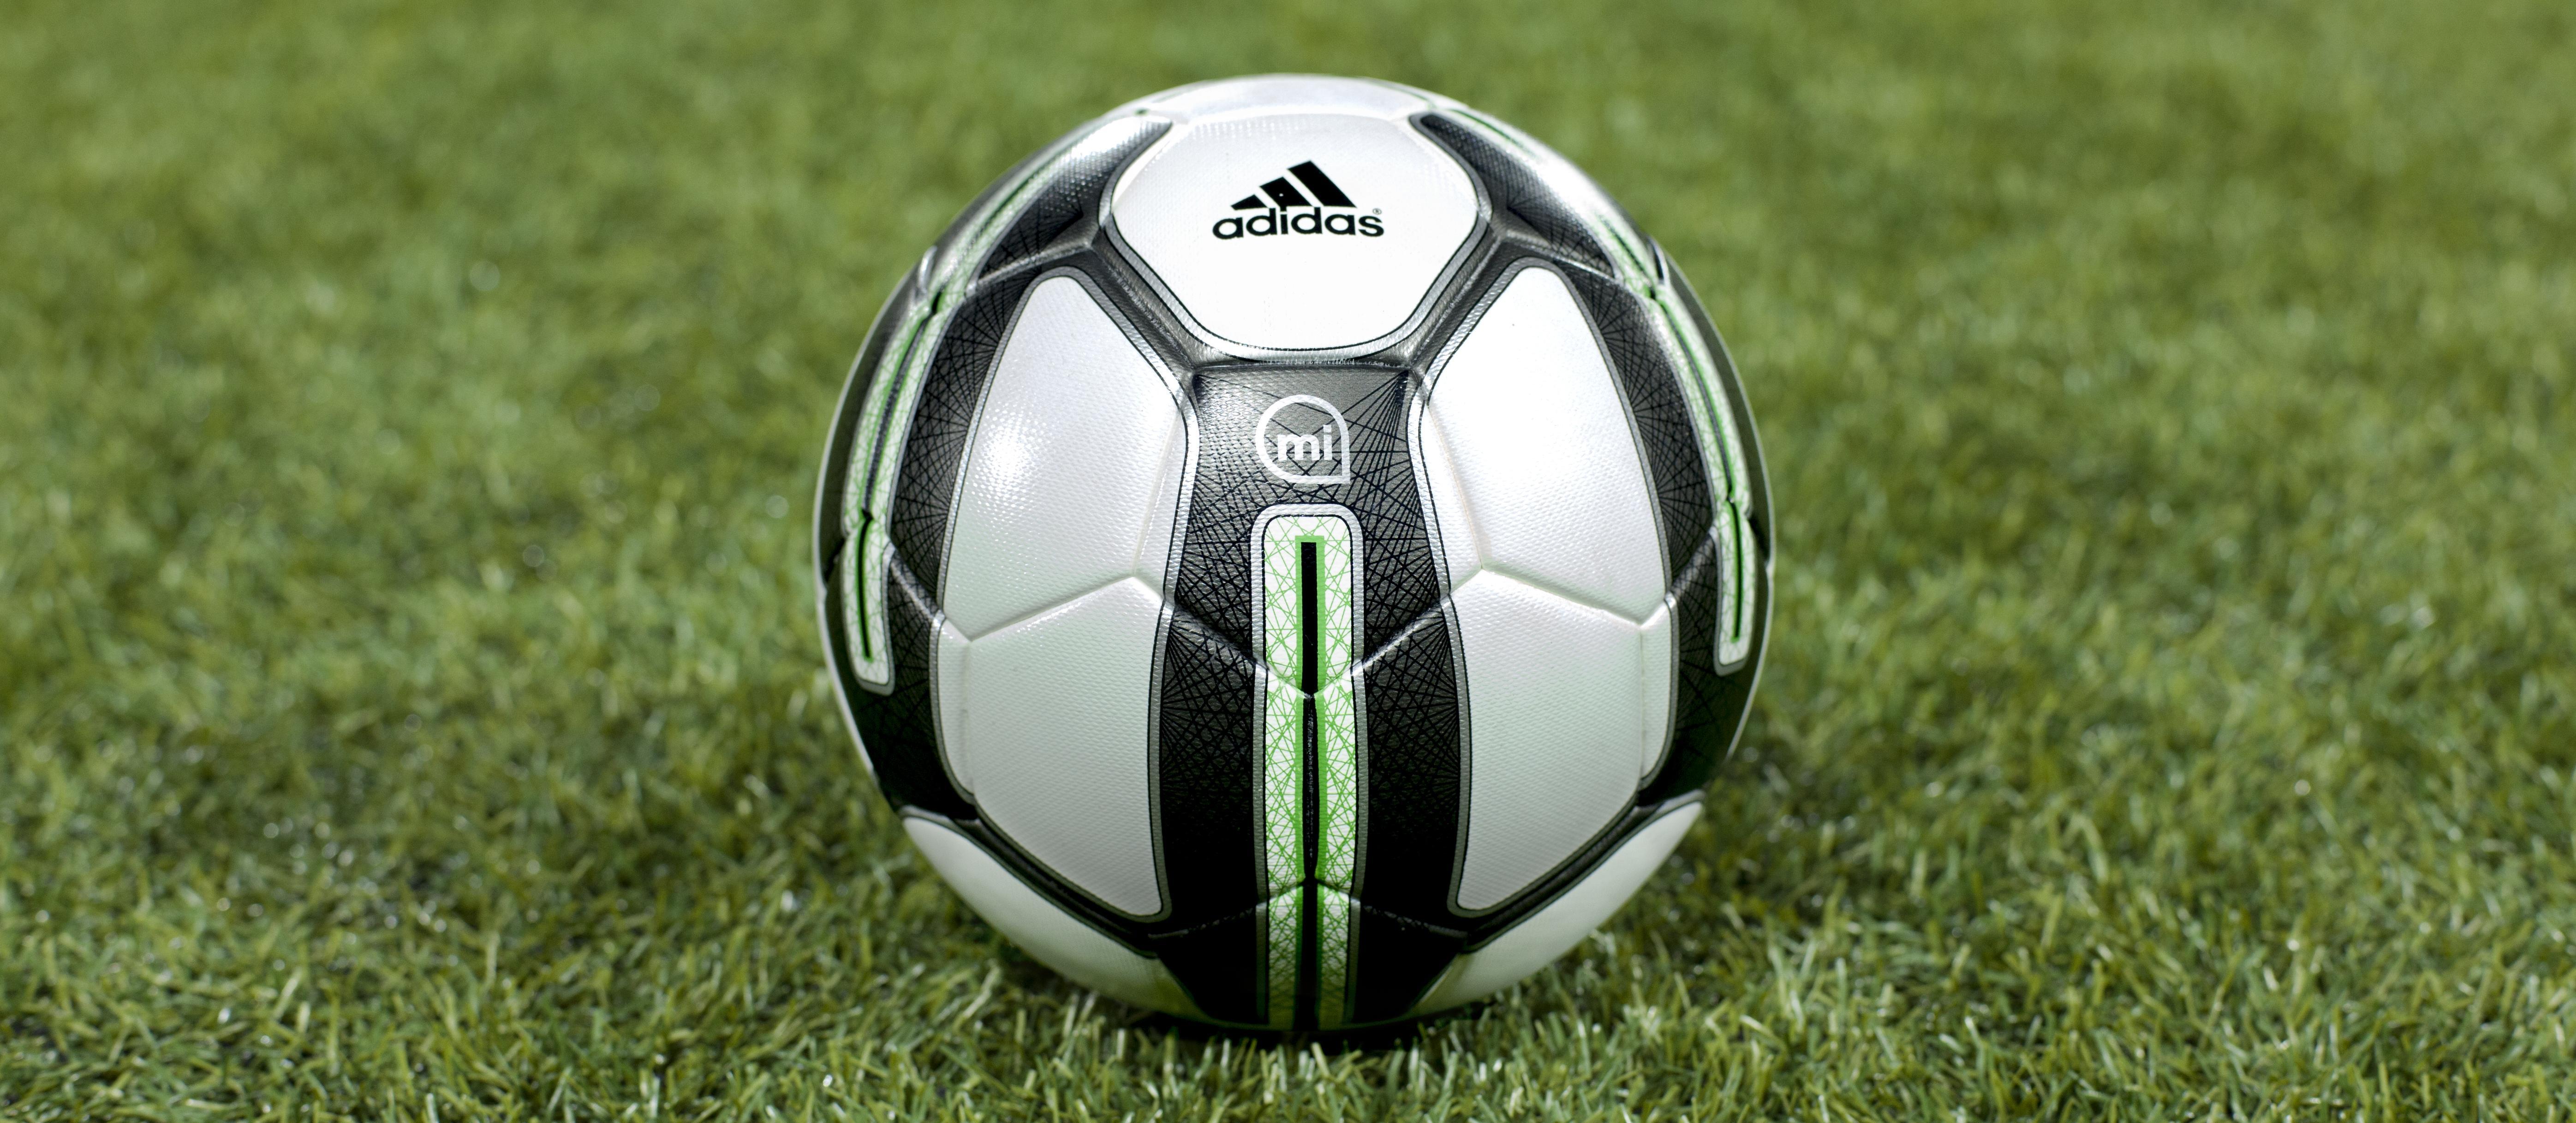 Adidas miCoach Smart Ball Helps you bend it like Beckham